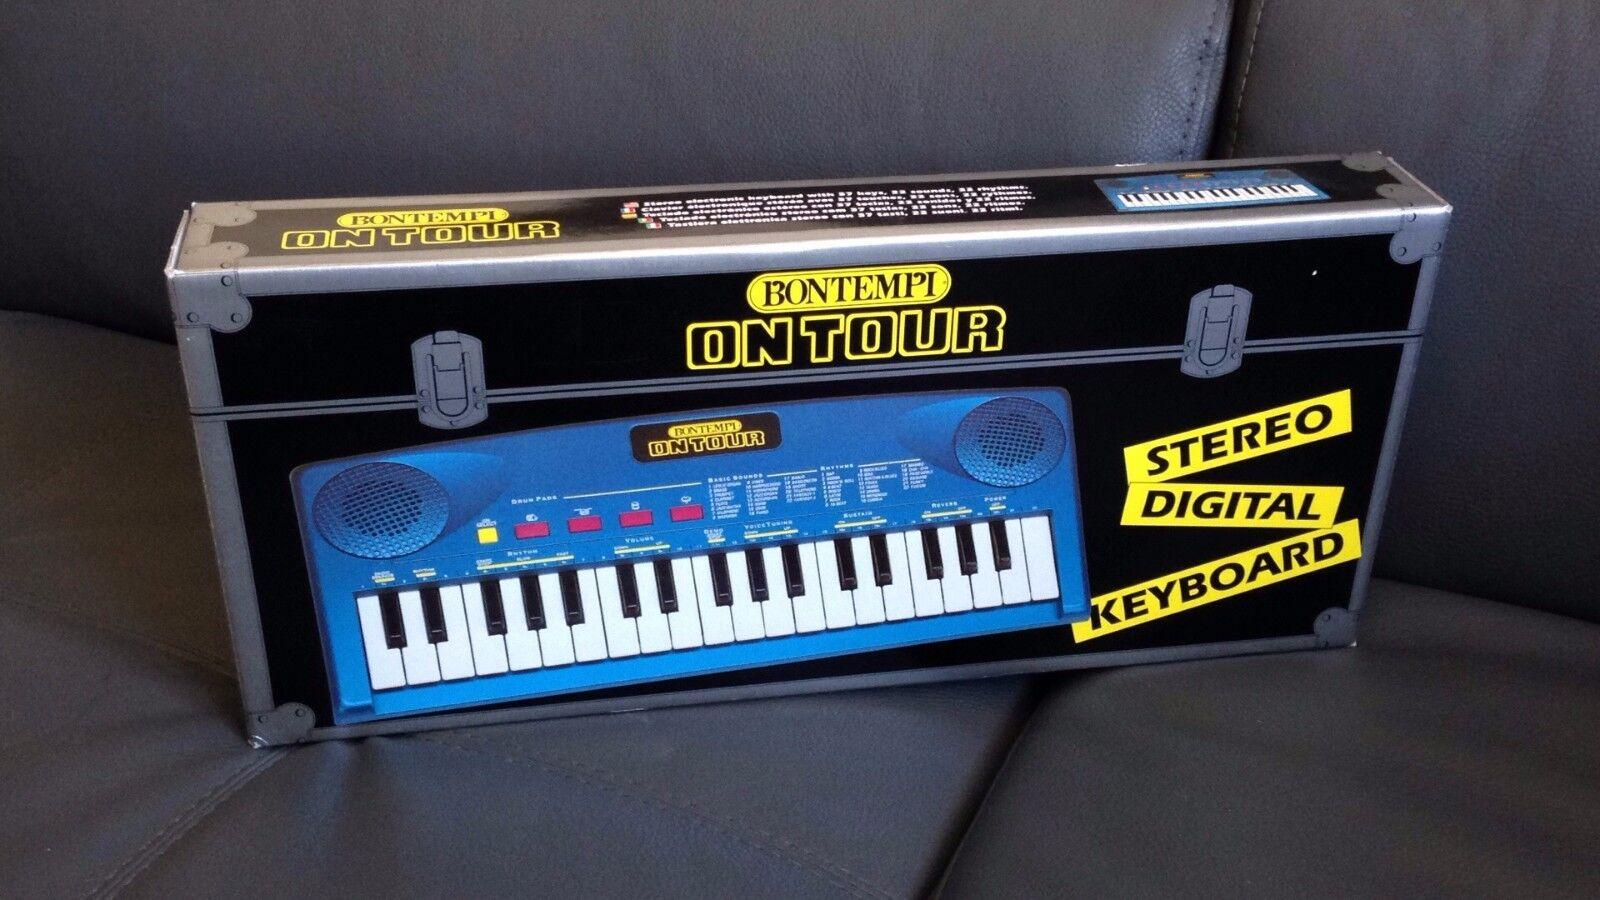 KEYBOARD pianola DIGITAL 37 KEYS KEYS DIGITAL STEREO KEYBOARD BONTEMPI ON TOUR